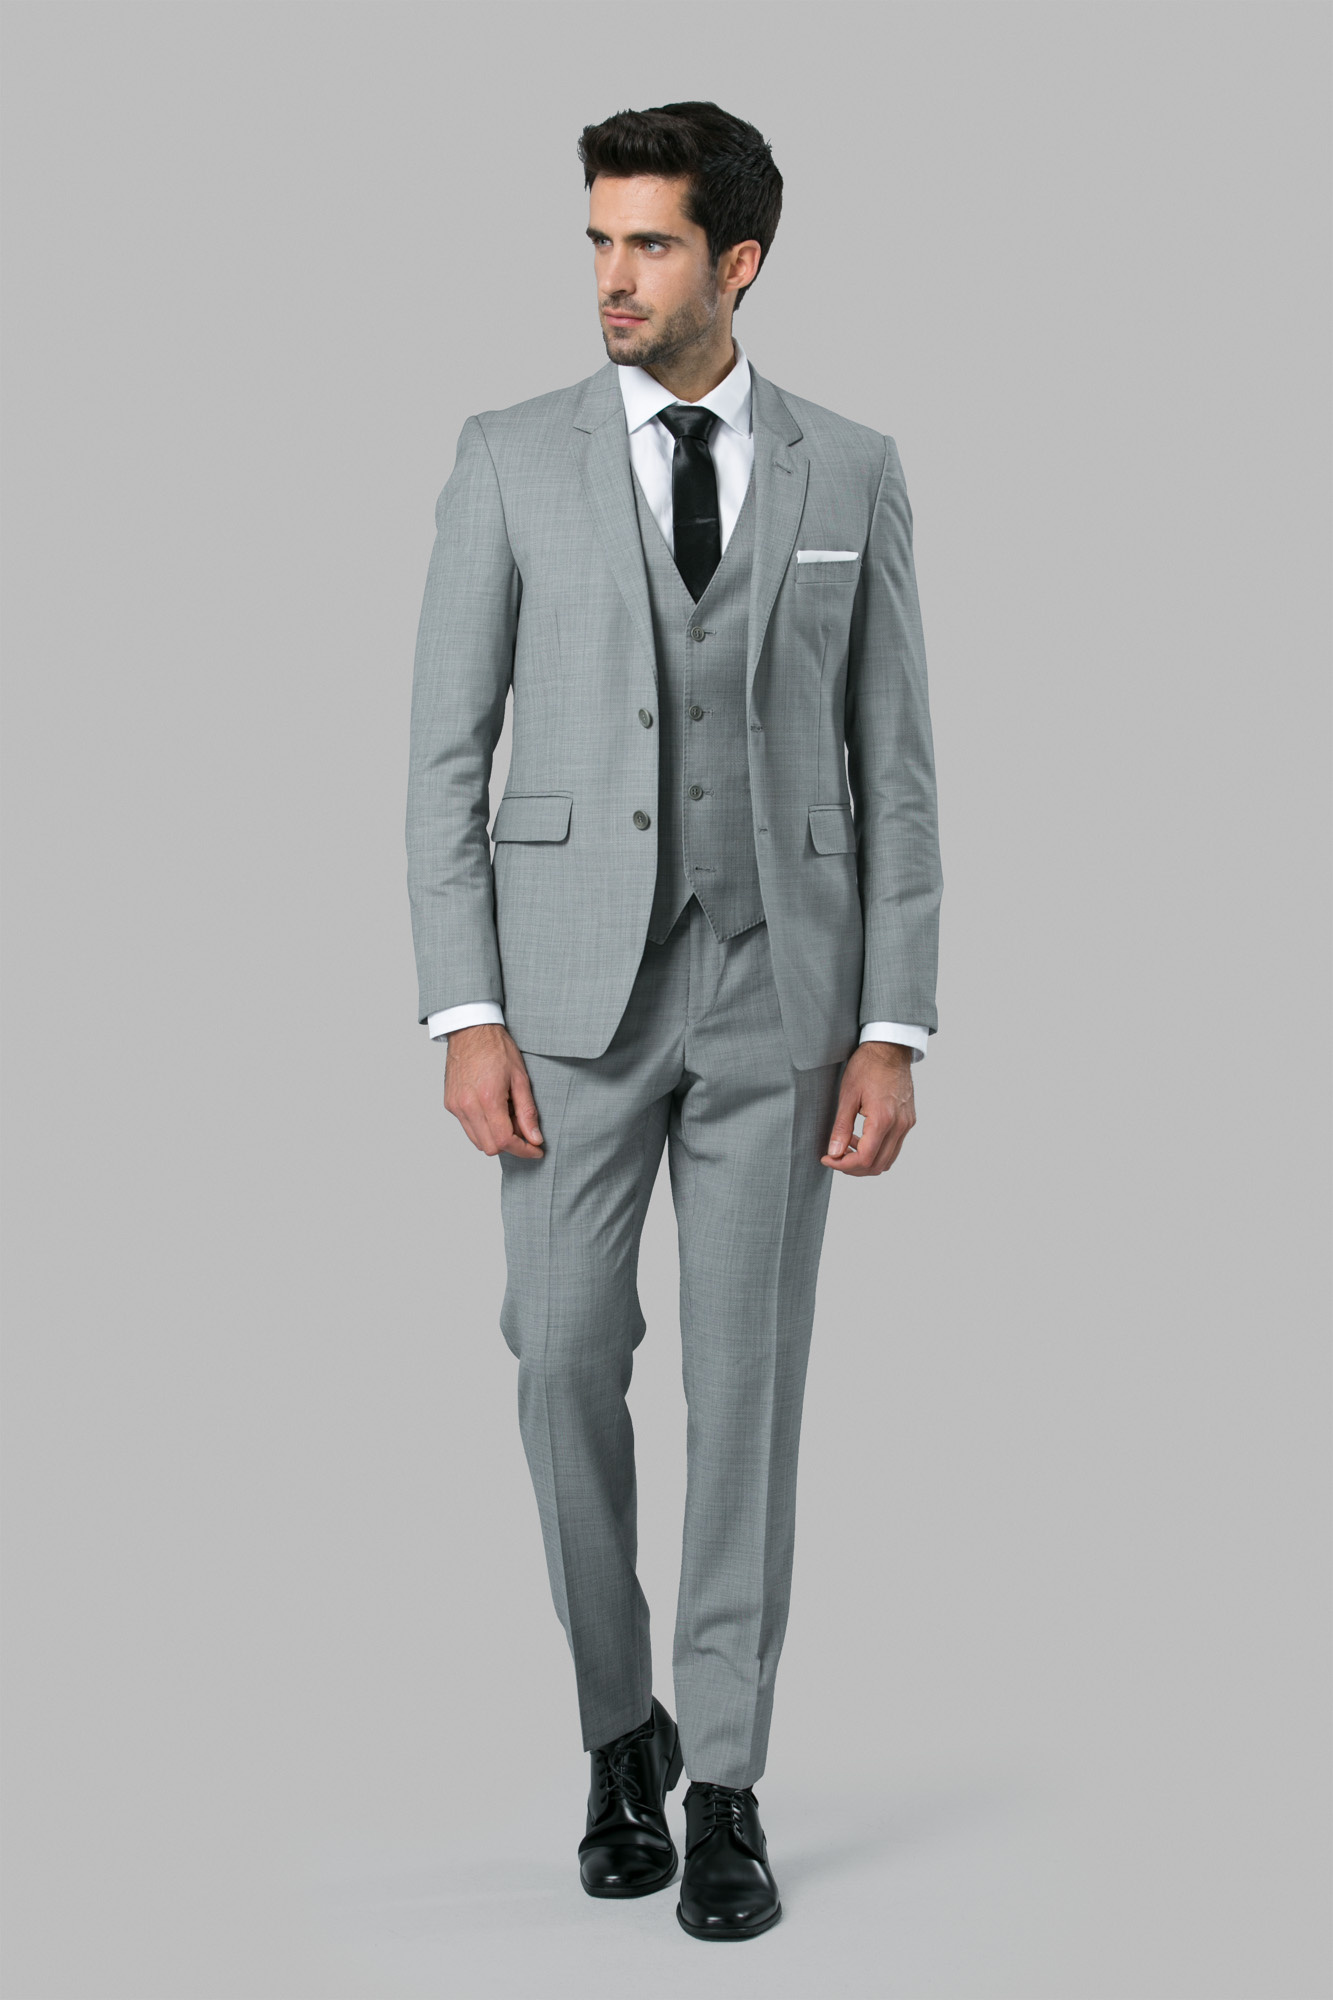 Grey 3 Piece Suit   Medium Grey Suit   Custom Suit Rentals